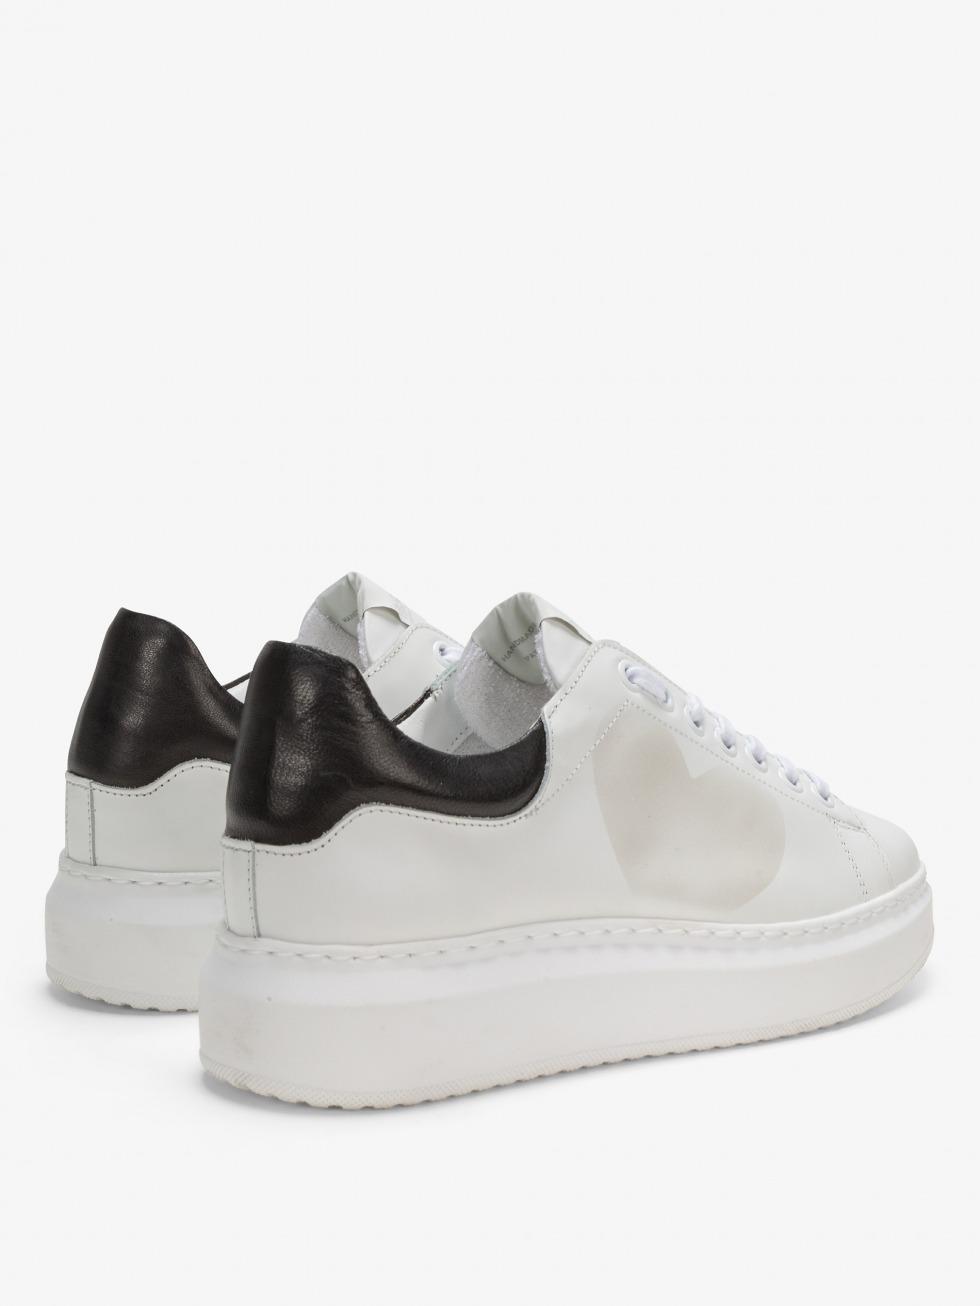 Angel Sneakers White Black - Heart